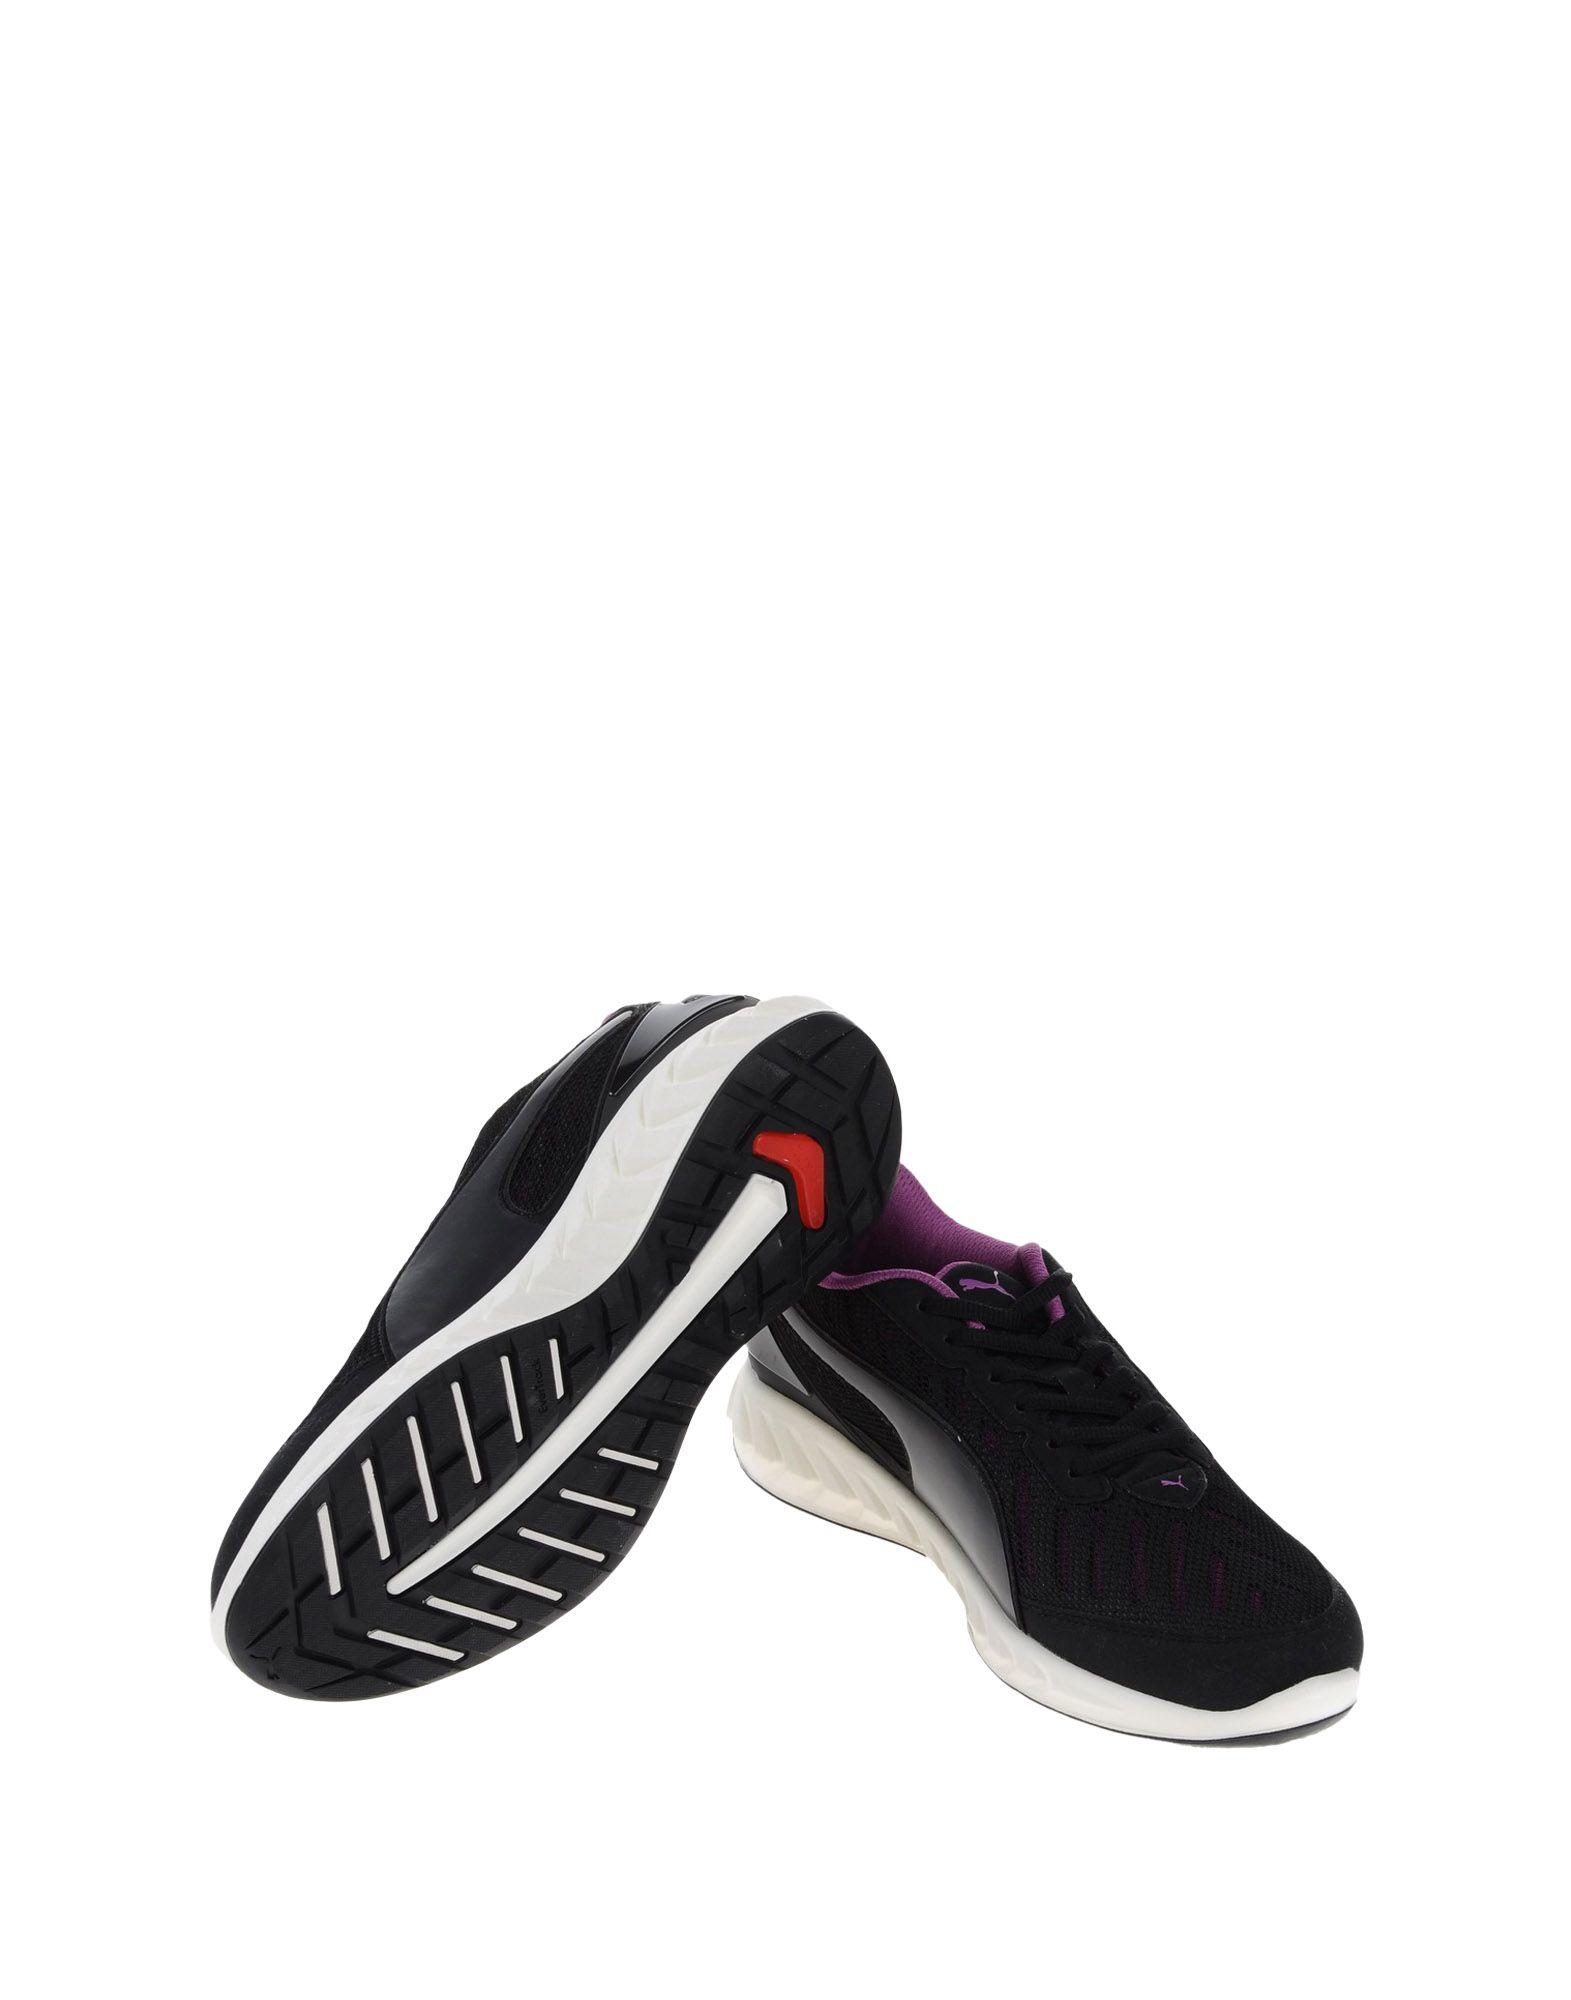 Sneakers Puma 188606-Ignite Ultimate Wns - Femme - Sneakers Puma sur